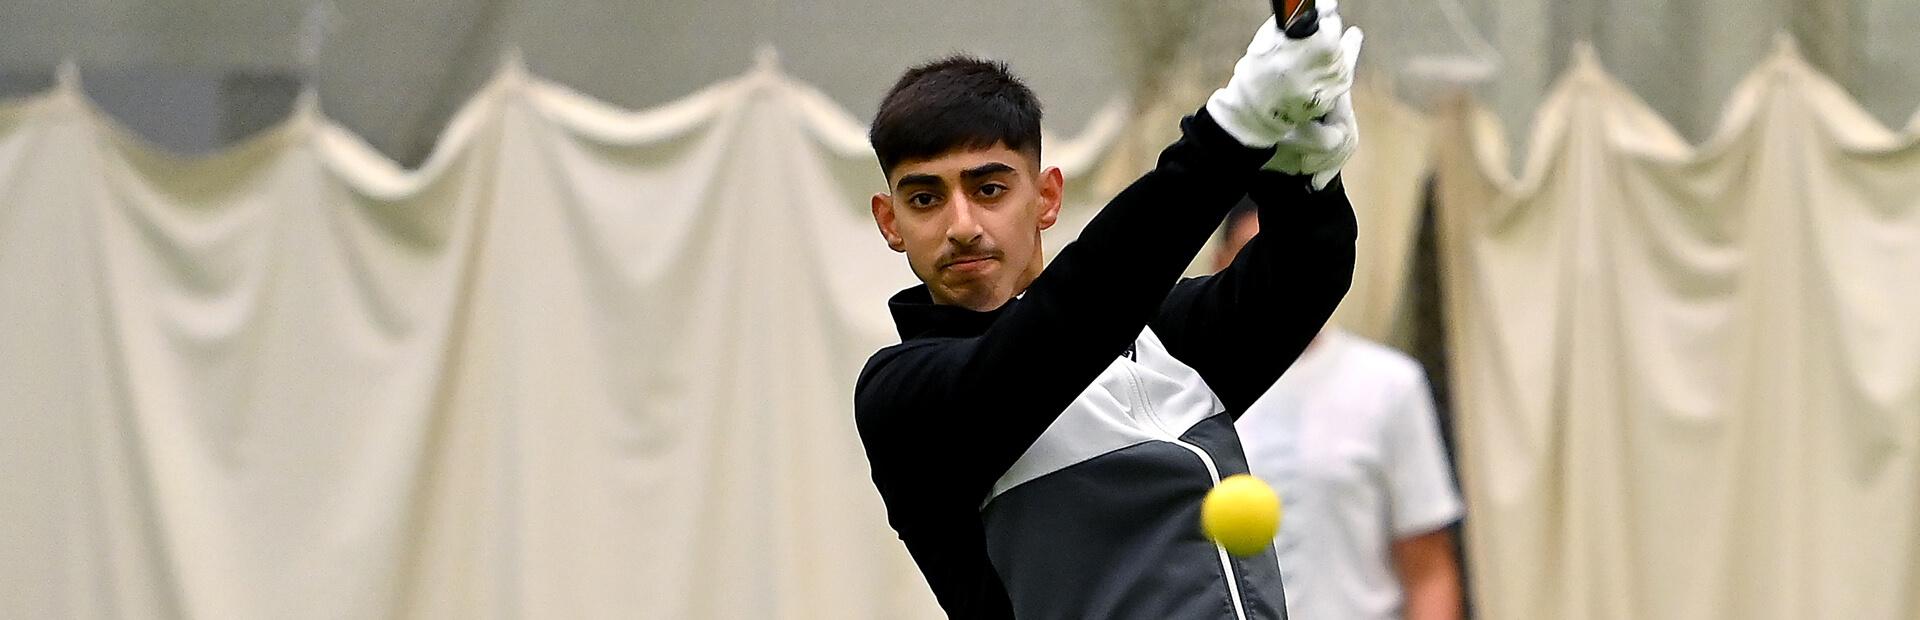 Warwickshire Cricket Board launch Ramadan Cricket League at Edgbaston